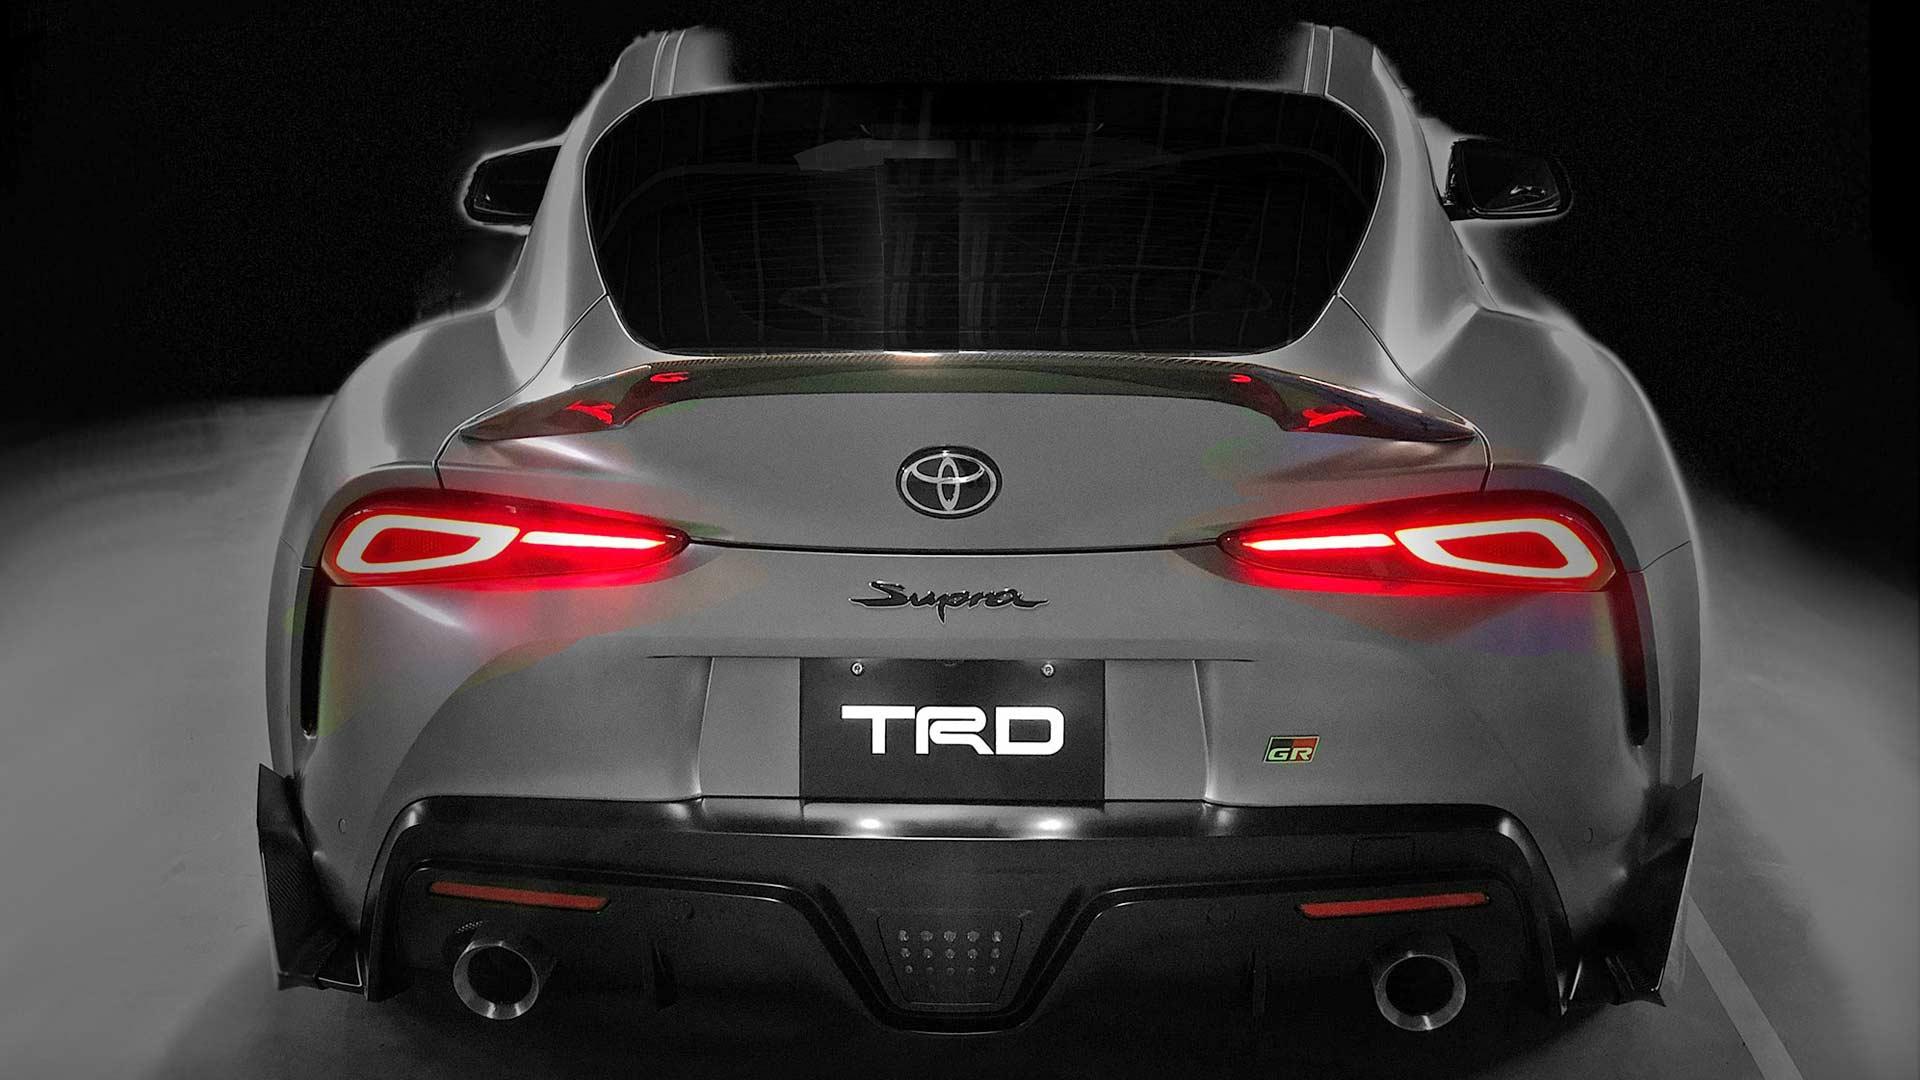 2020-Toyota-Supra-TRD-parts-concept_4